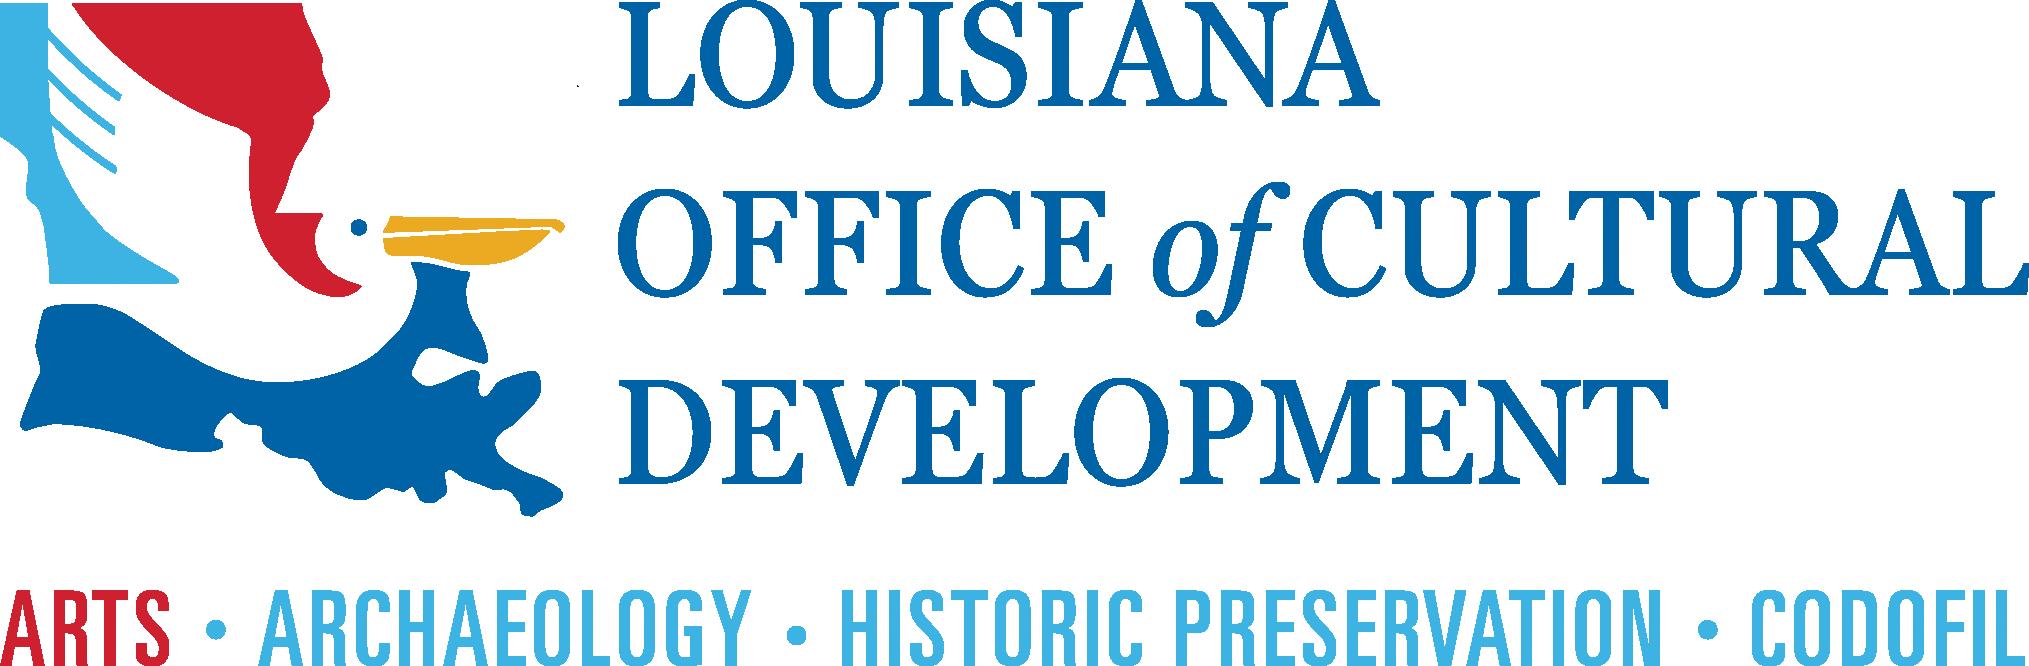 Louisiana Office of Cultural Development logo